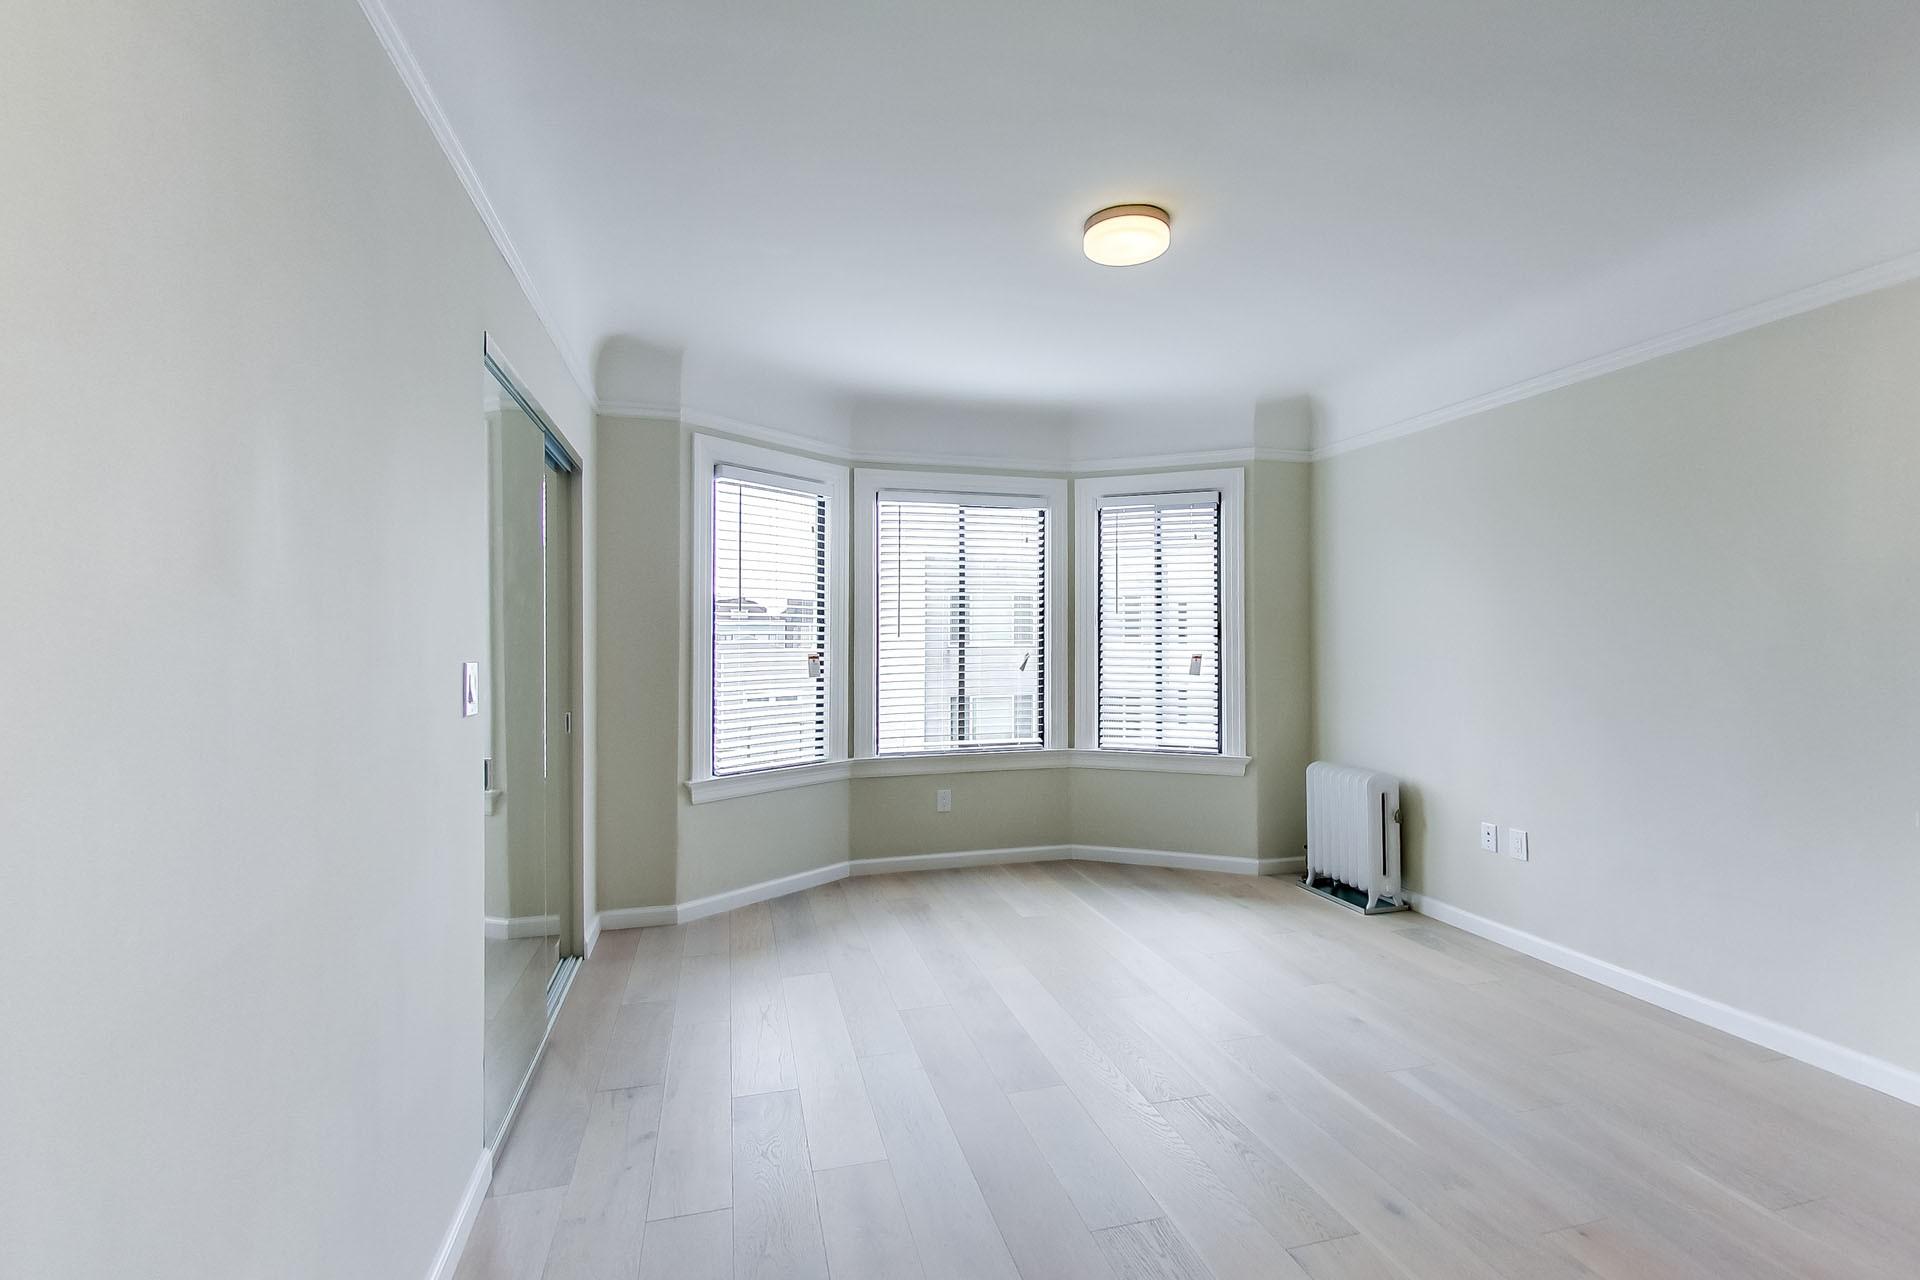 337 10TH AVENUE Apartments